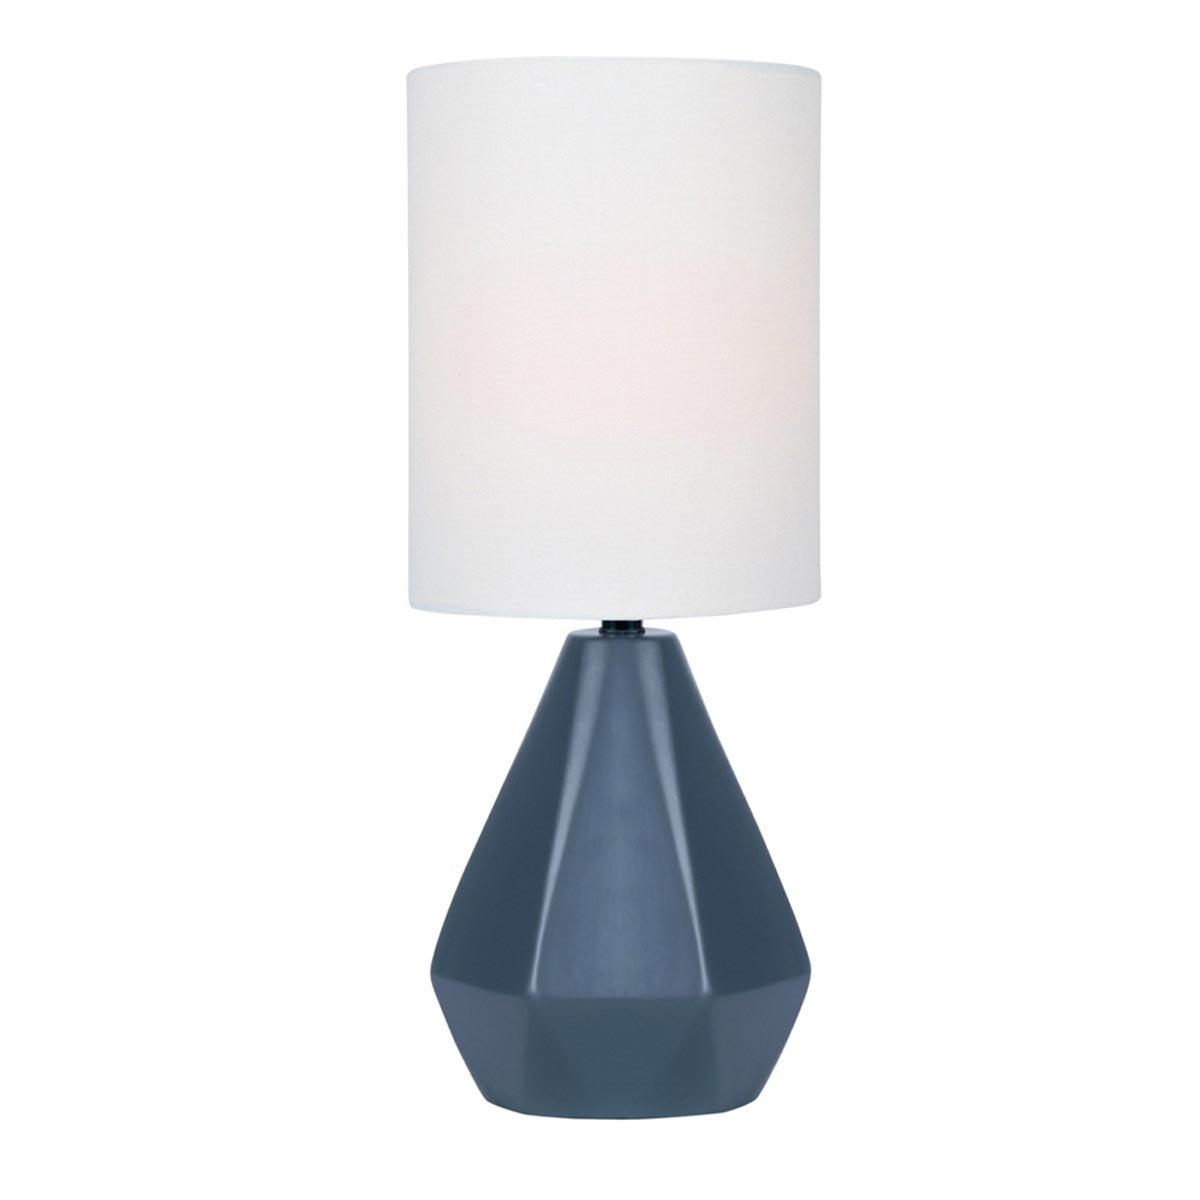 Mason Table Lamp, Black